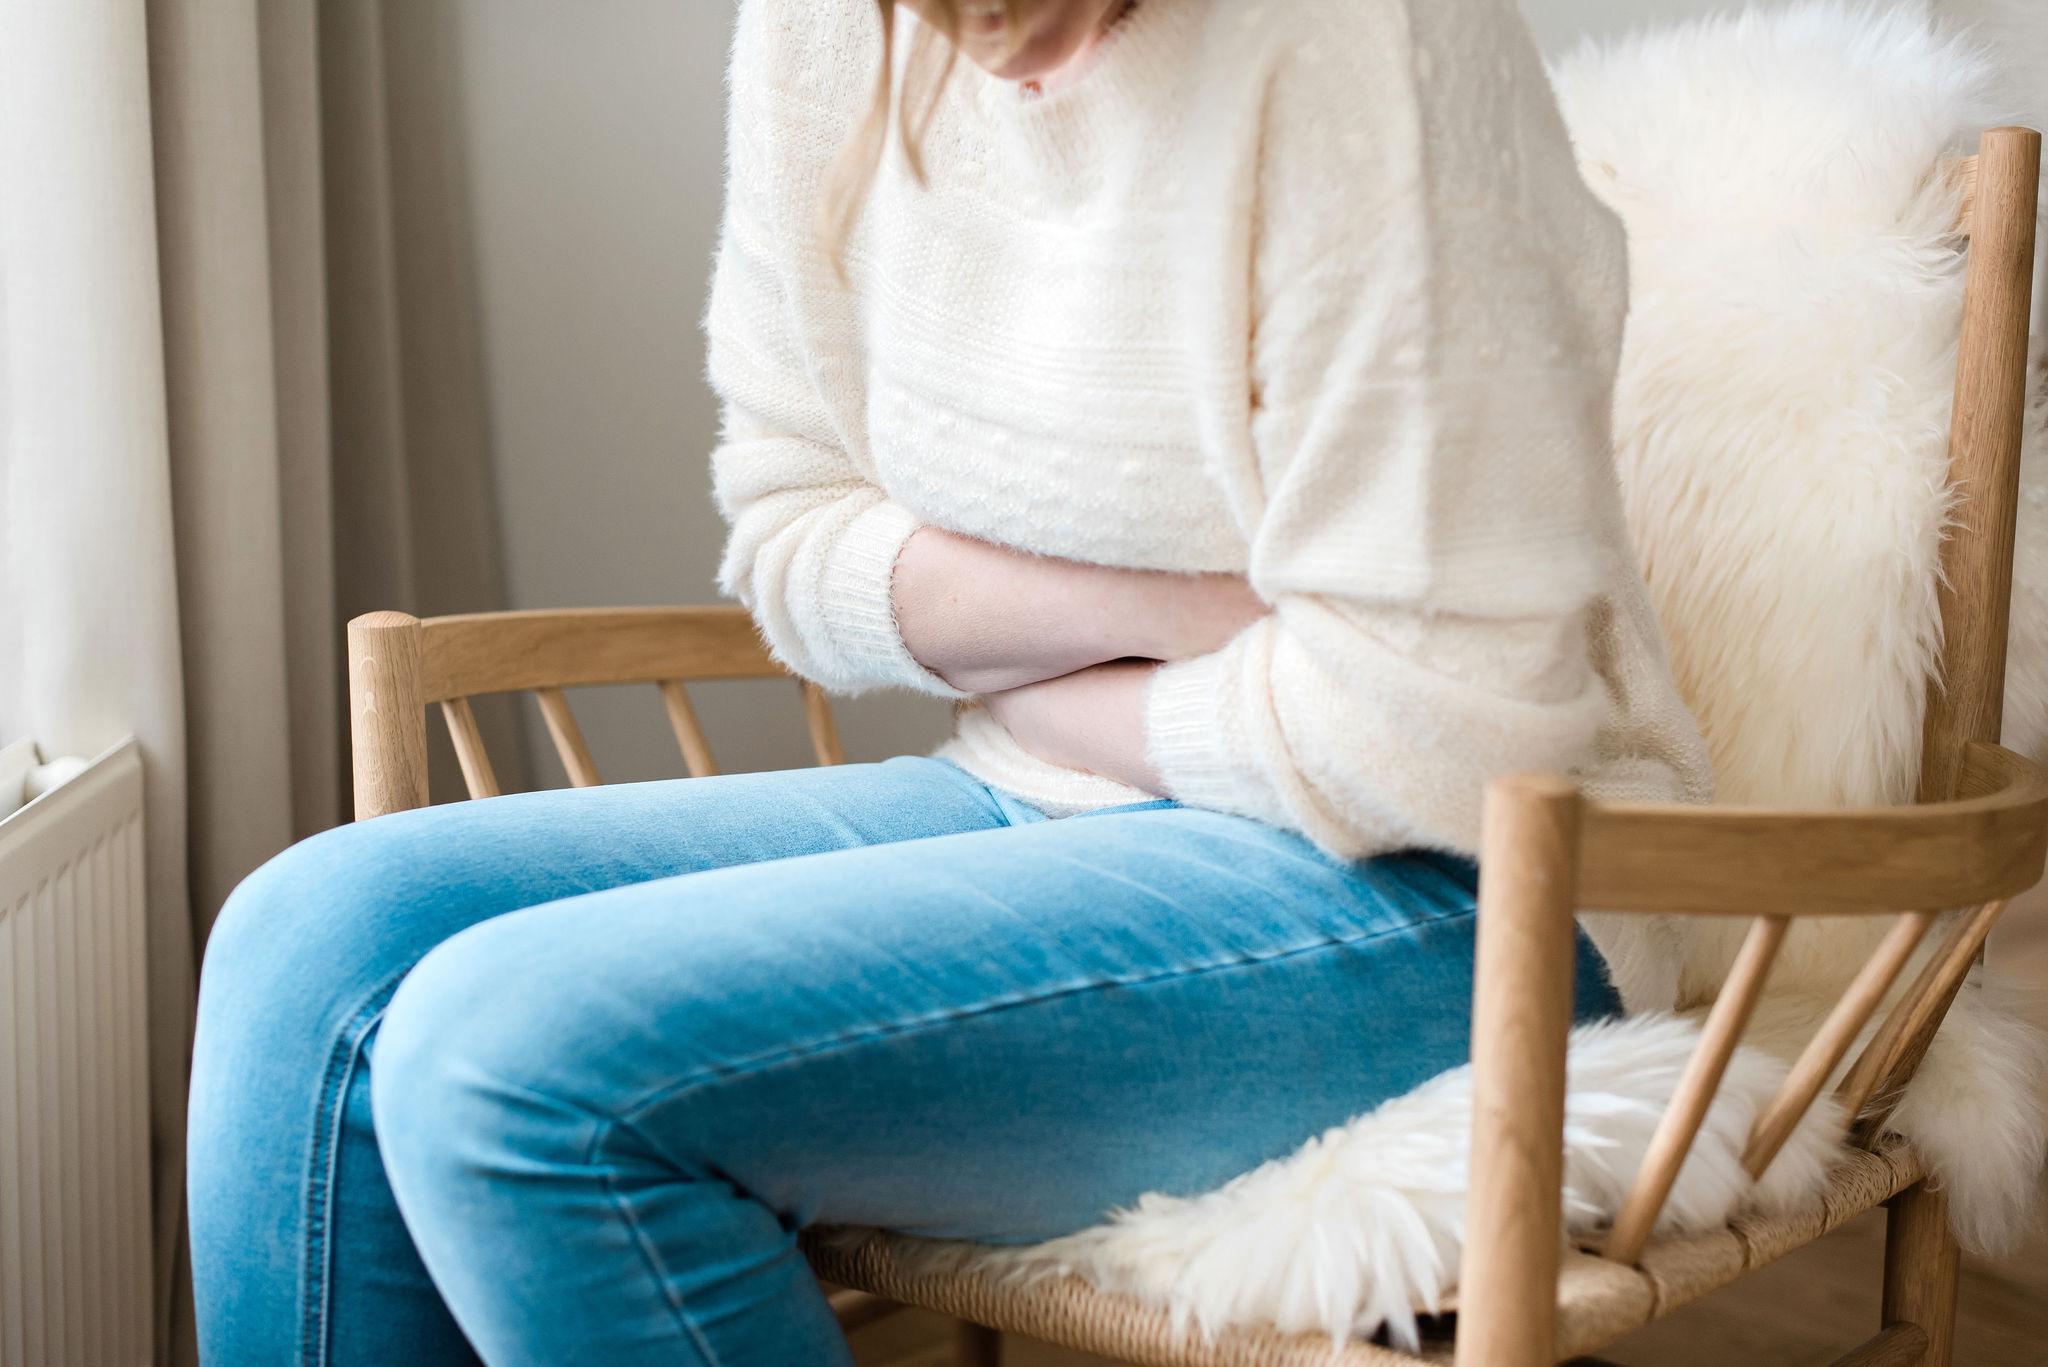 BiancaHermans-Eetgedragstherapeut-CoeliakieCoach-MentalCoach-OVeRmethode-eetgedragstherapie-dieetadvies-coaching